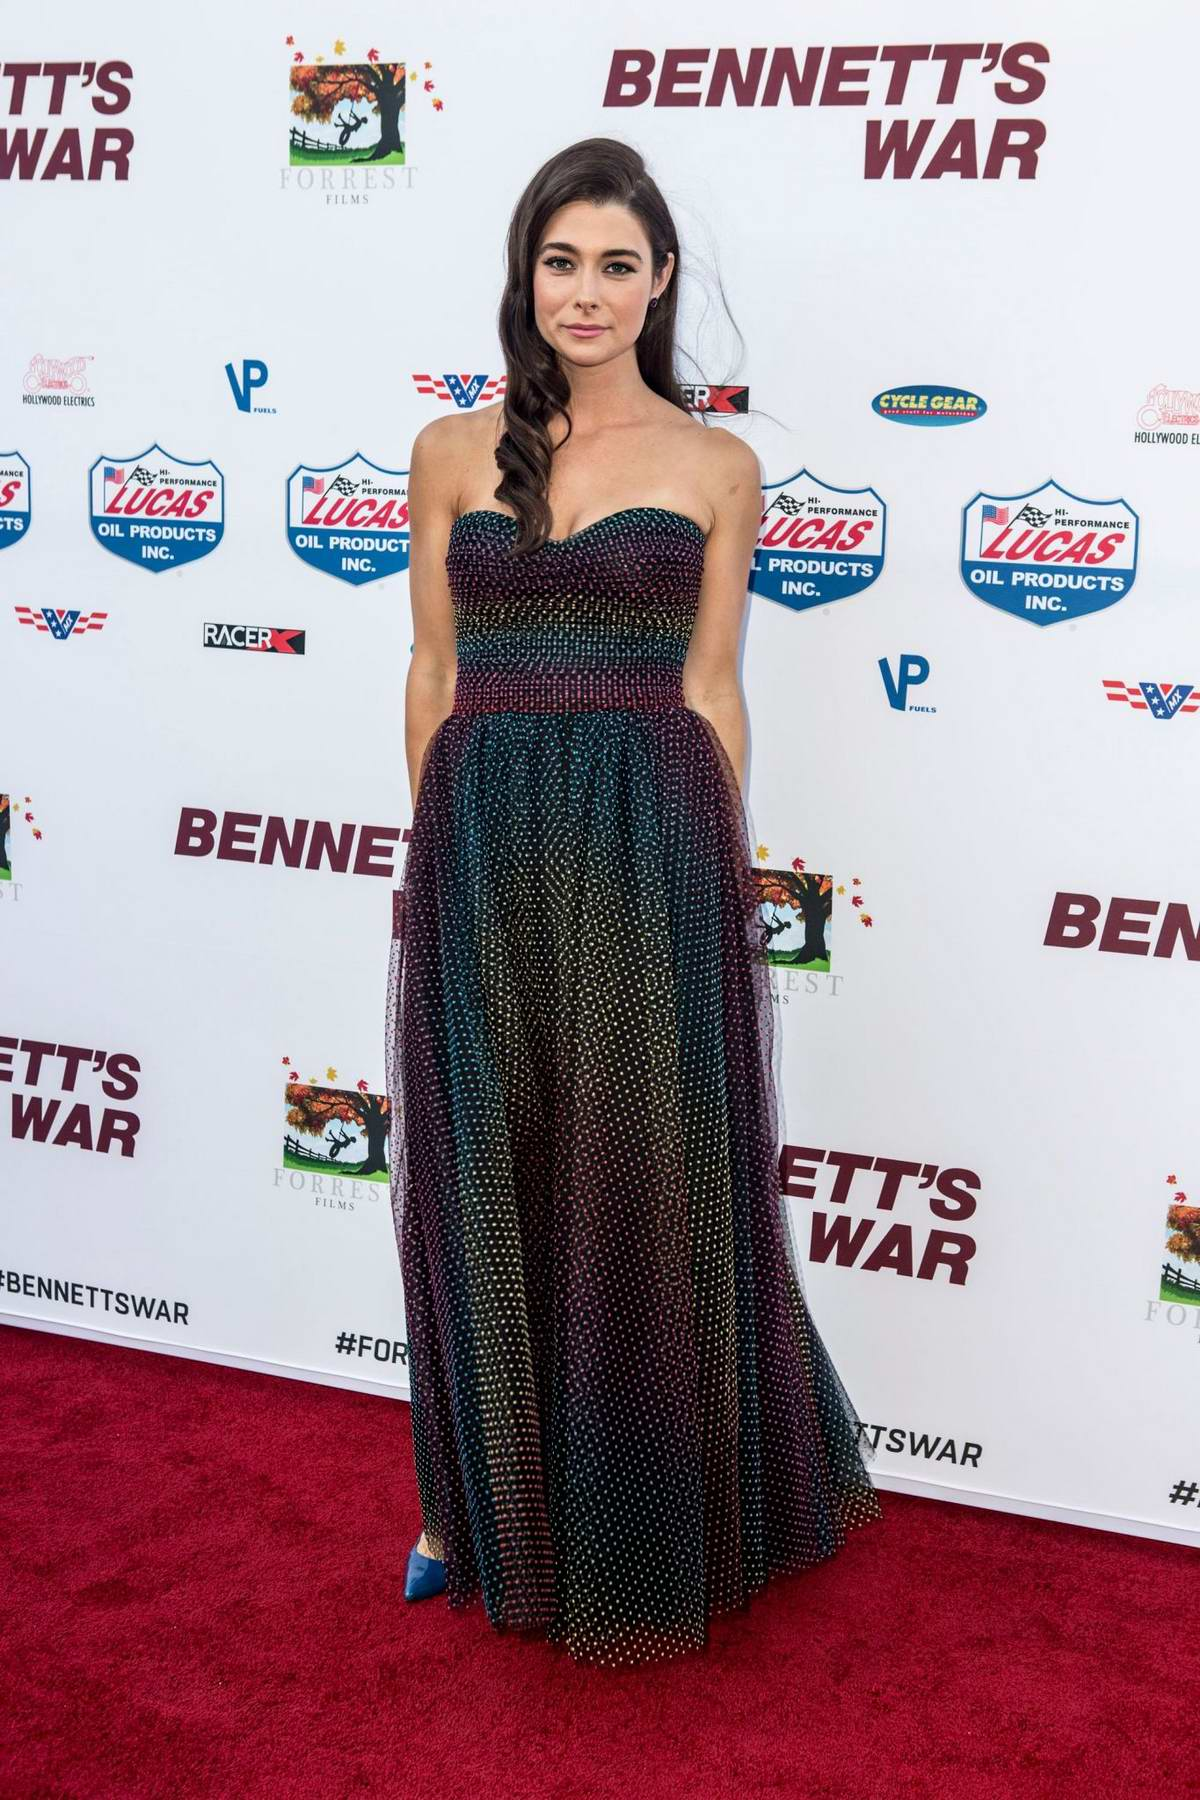 Allison Paige attends the LA Premiere of 'Bennett's War' at Warner Bros Studios in Burbank, California